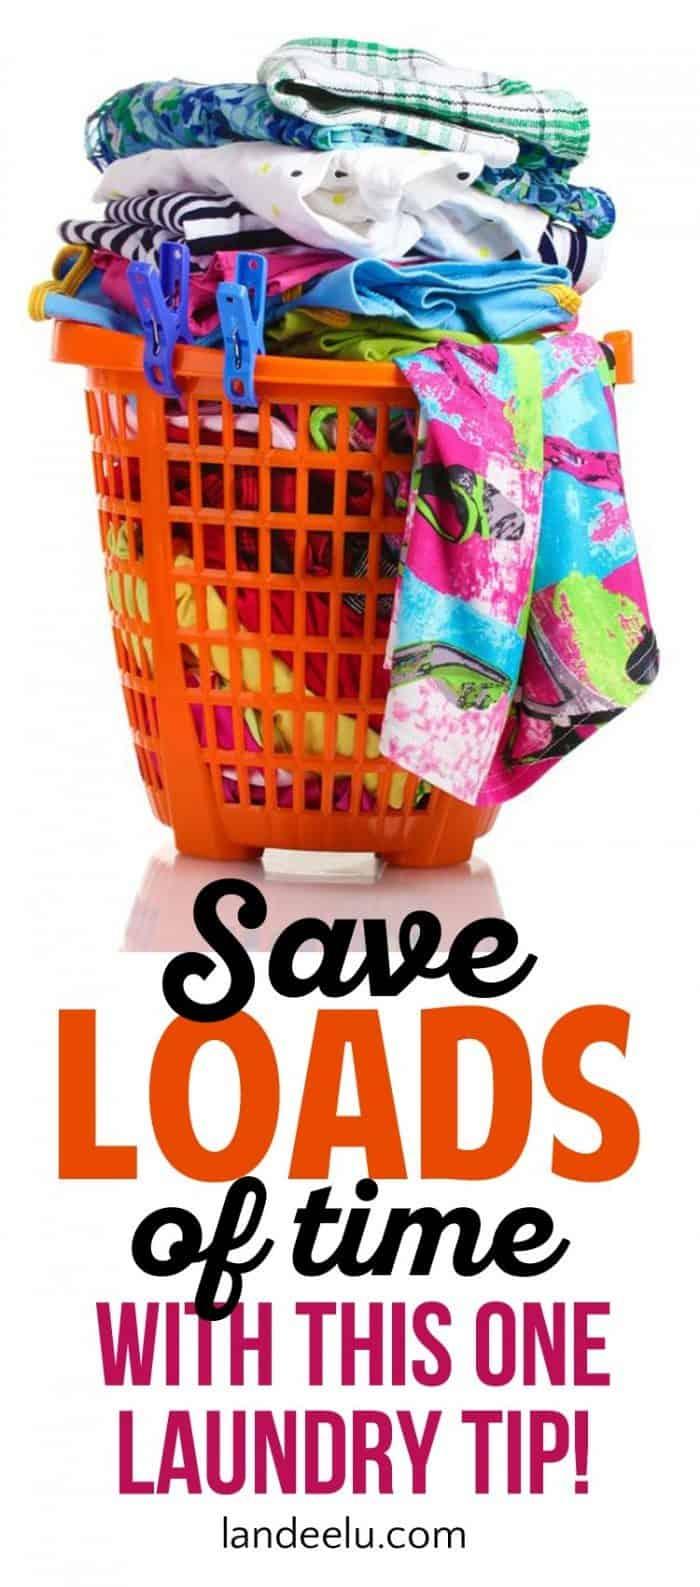 laundry-tip